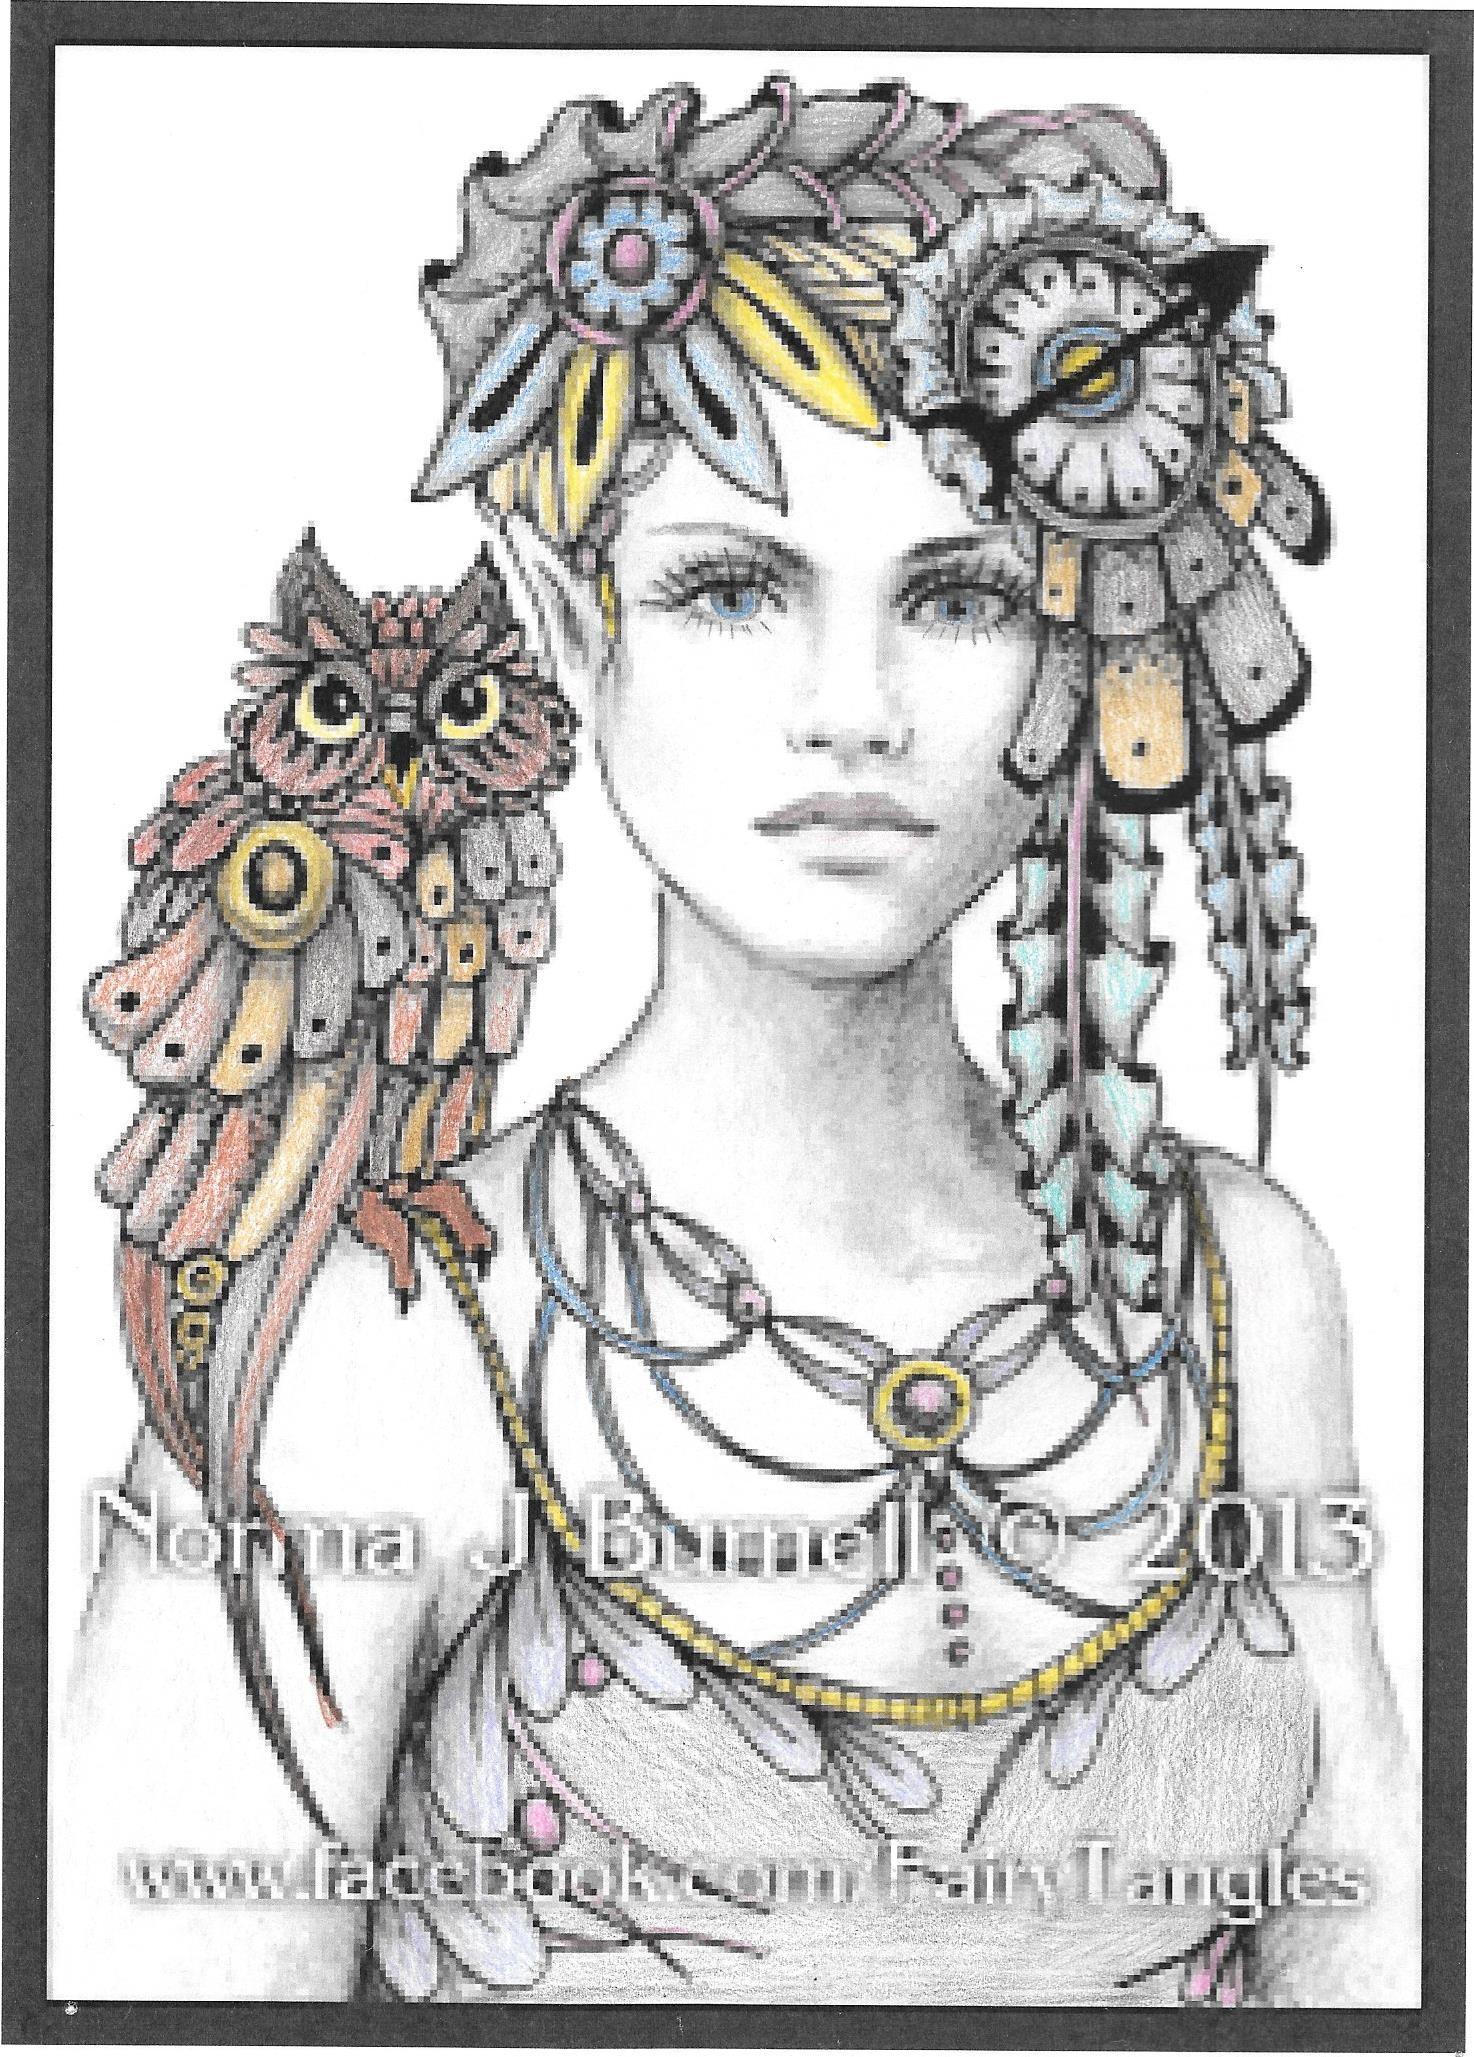 Pin de Alberta Carter Lopez en Finished Coloring Pages | Pinterest